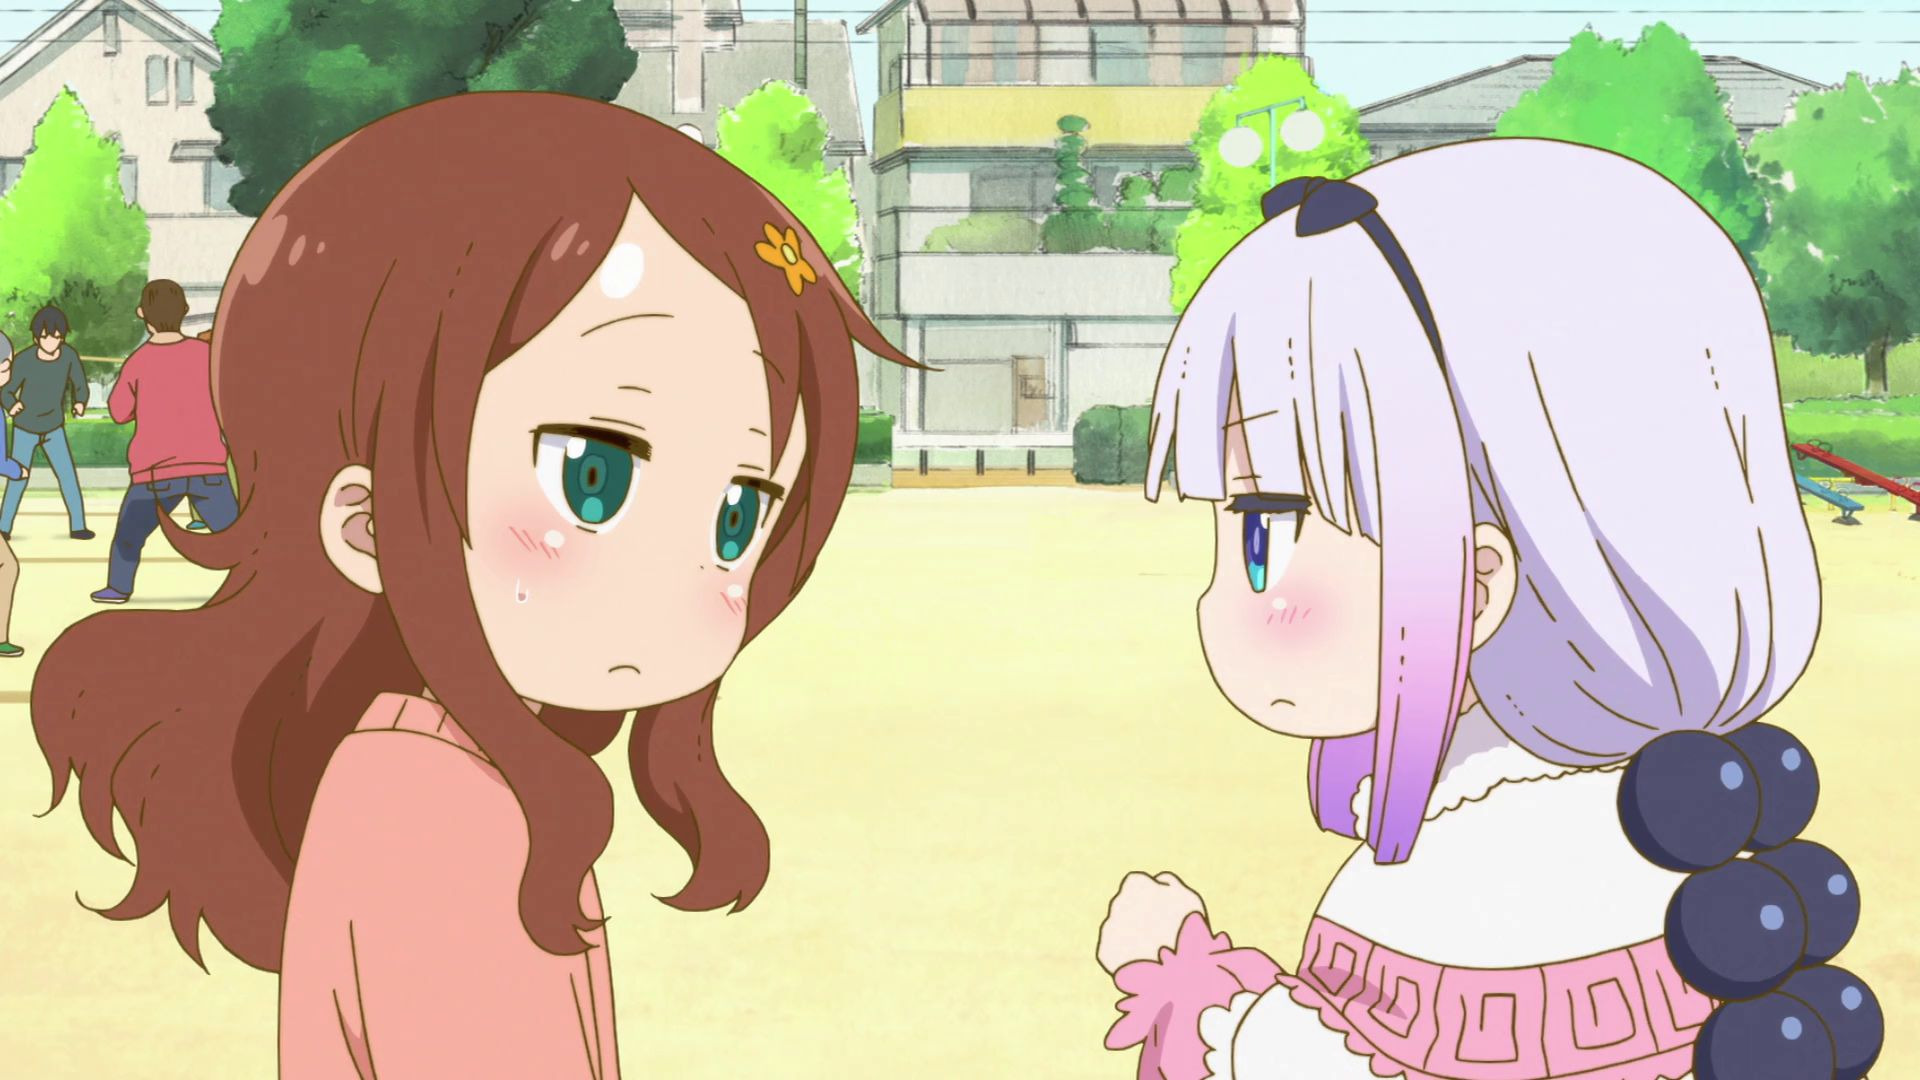 Дракон-горничная госпожи Кобаяши — s01e04 — Kanna Goes to School! (Not That She Needs To)